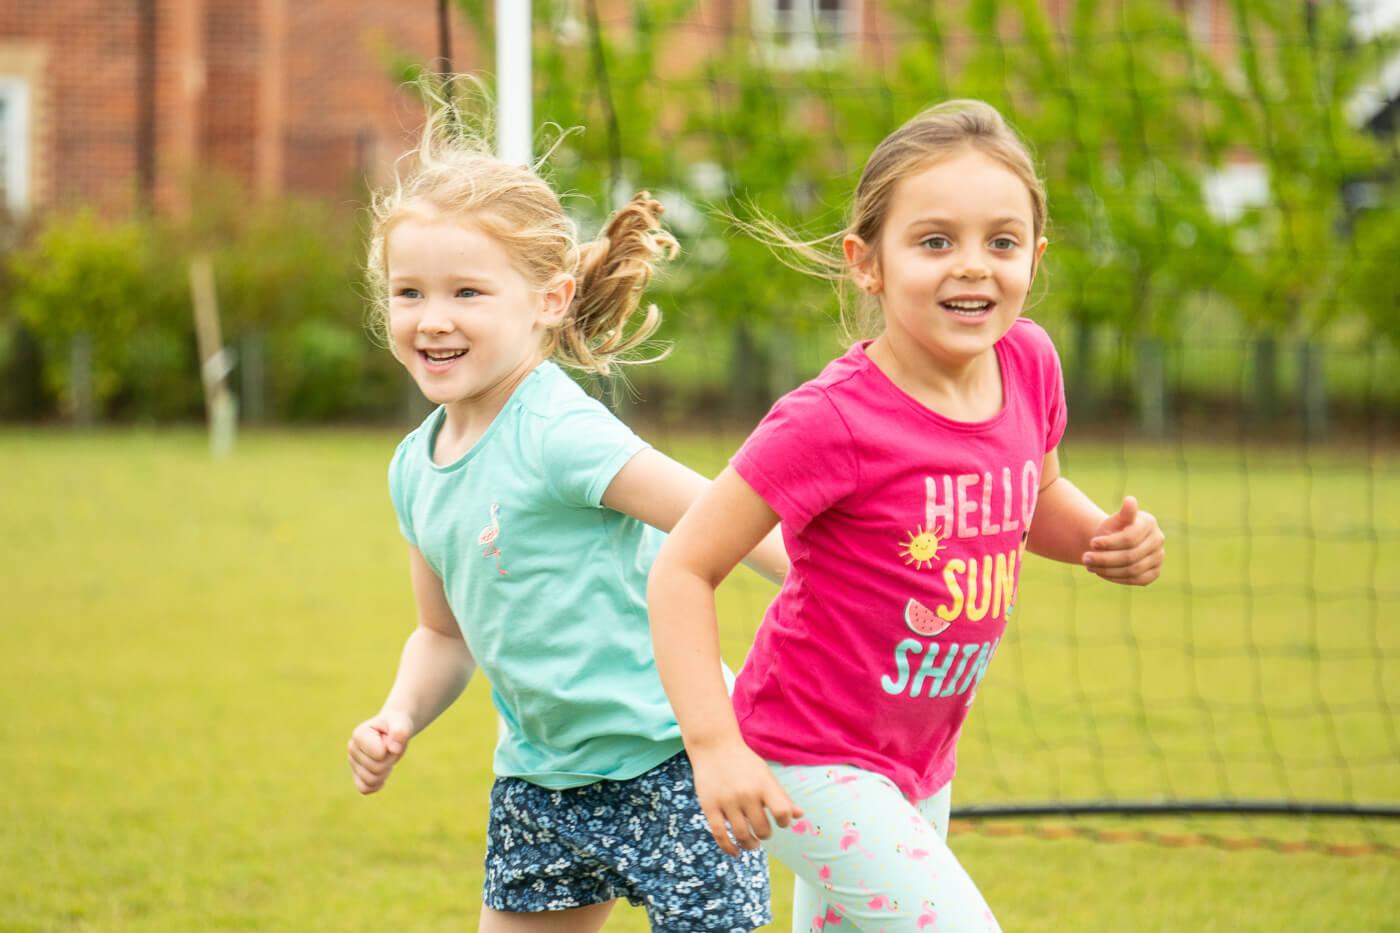 Young children enjoying the outdoors.